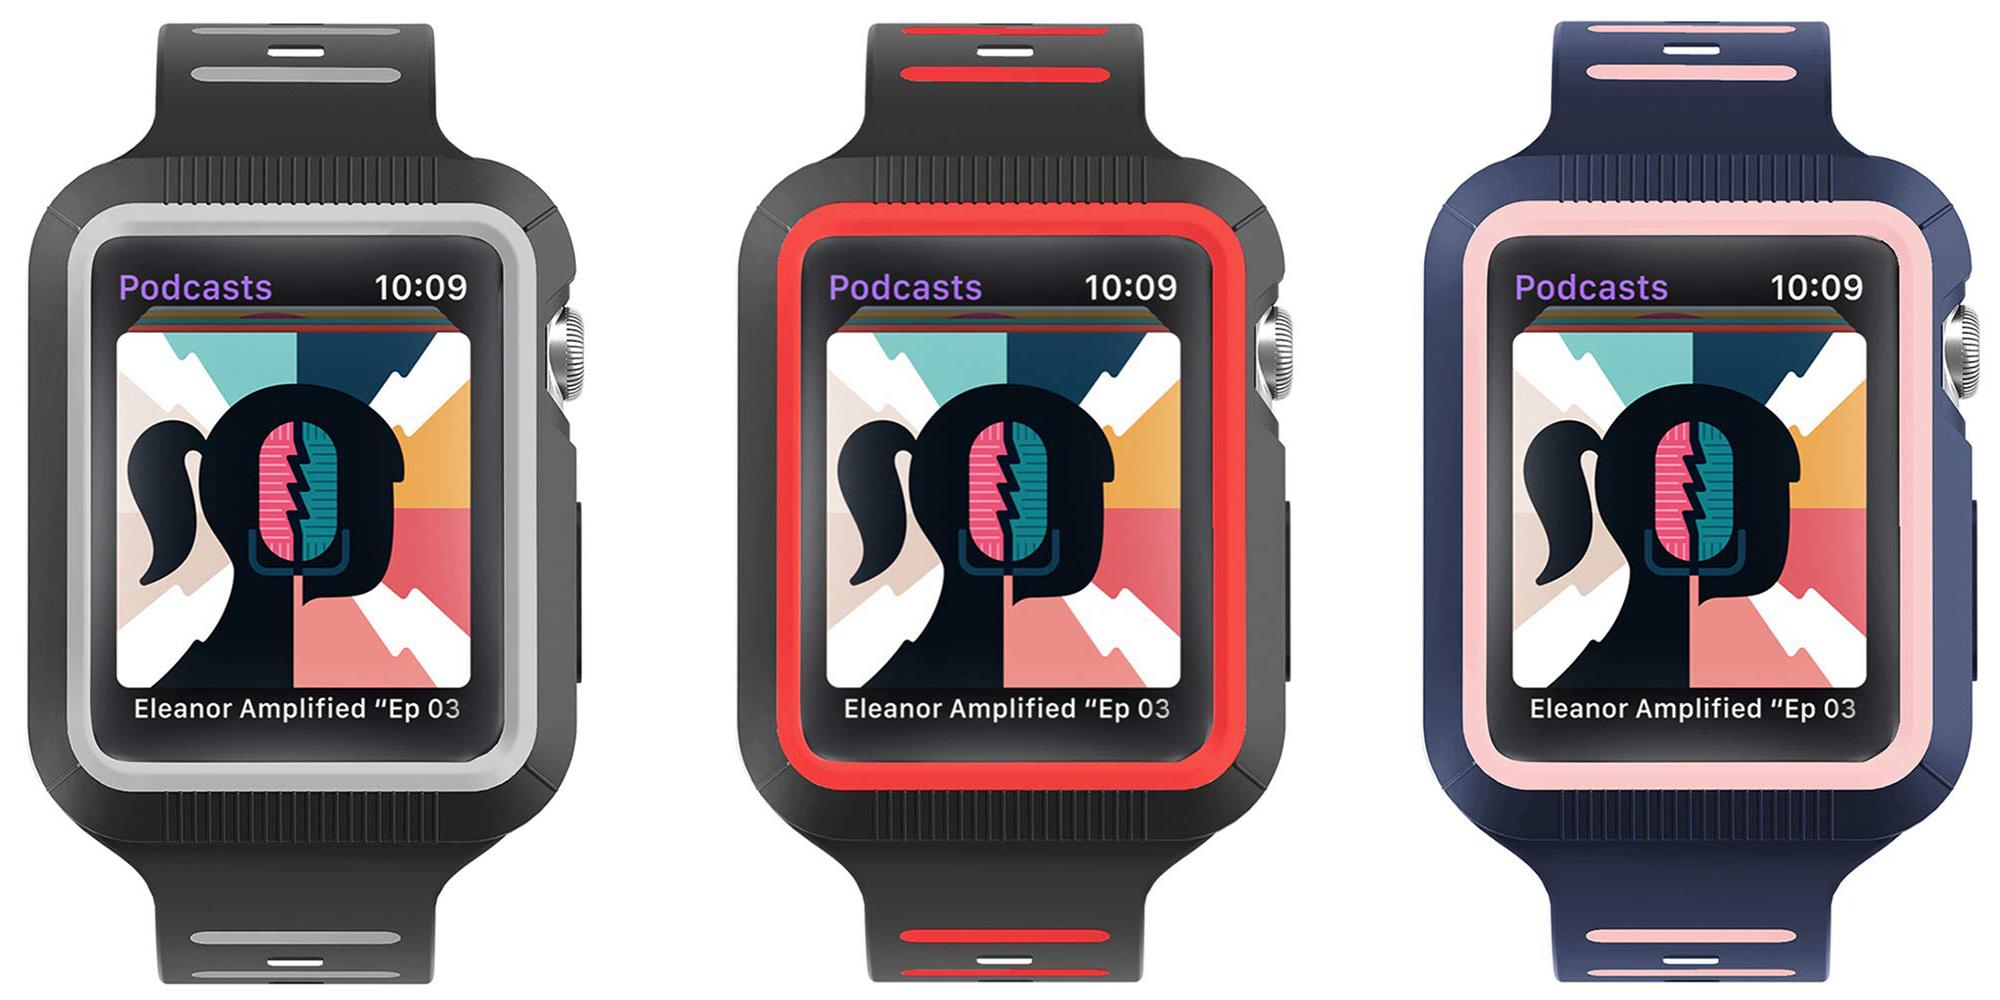 BRG Apple Watch bands